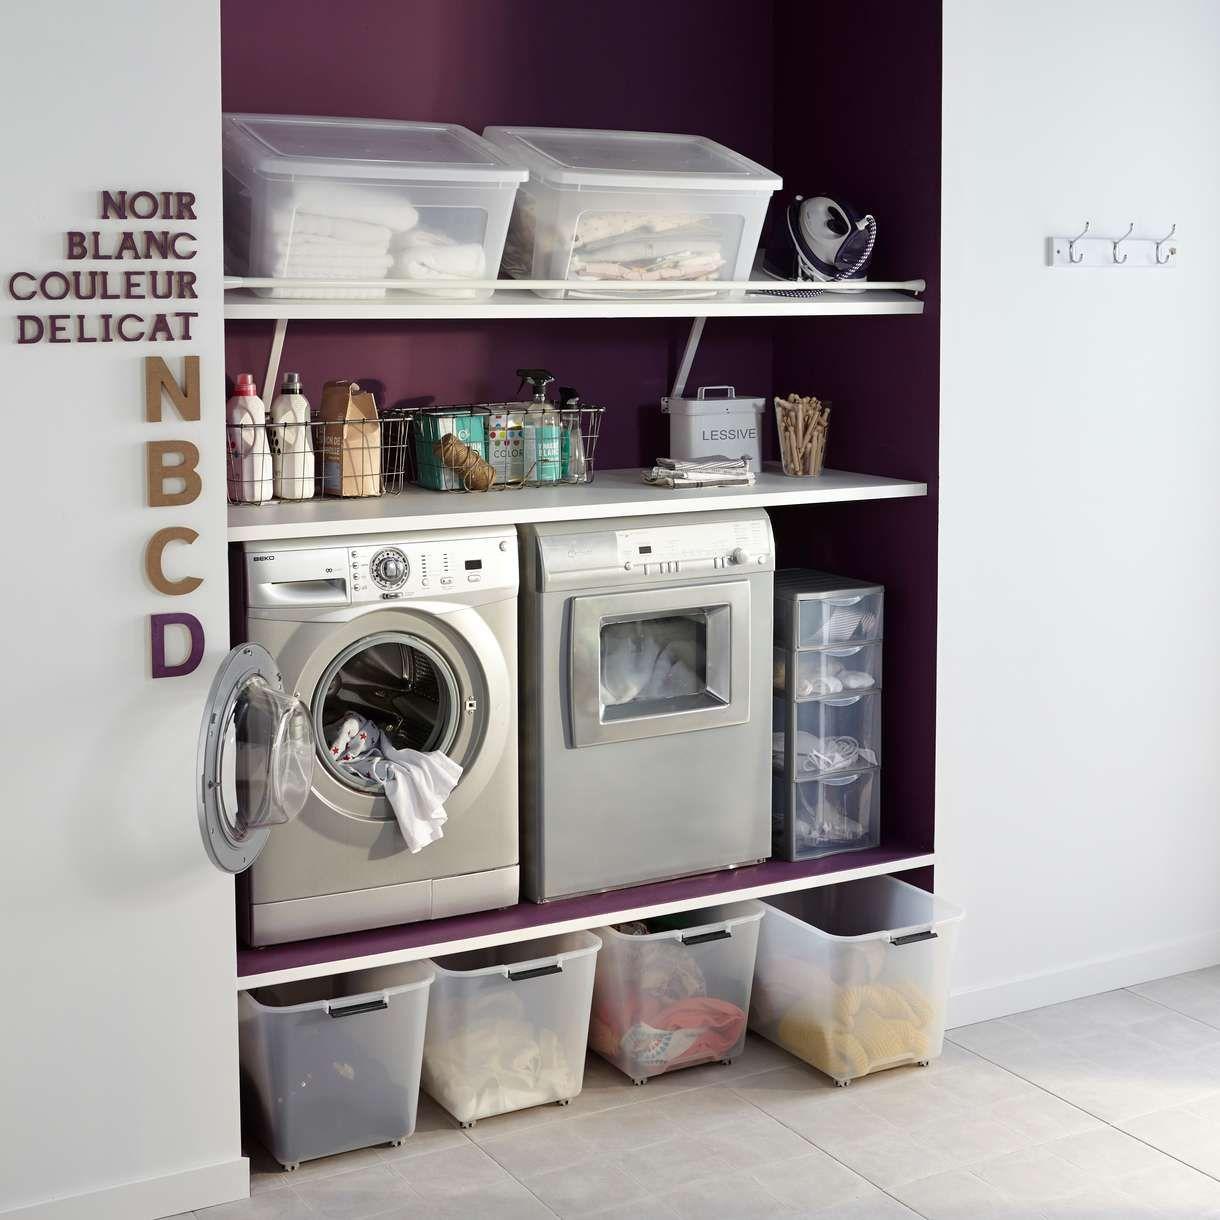 des buanderies bien rang es laundry laundry rooms and. Black Bedroom Furniture Sets. Home Design Ideas